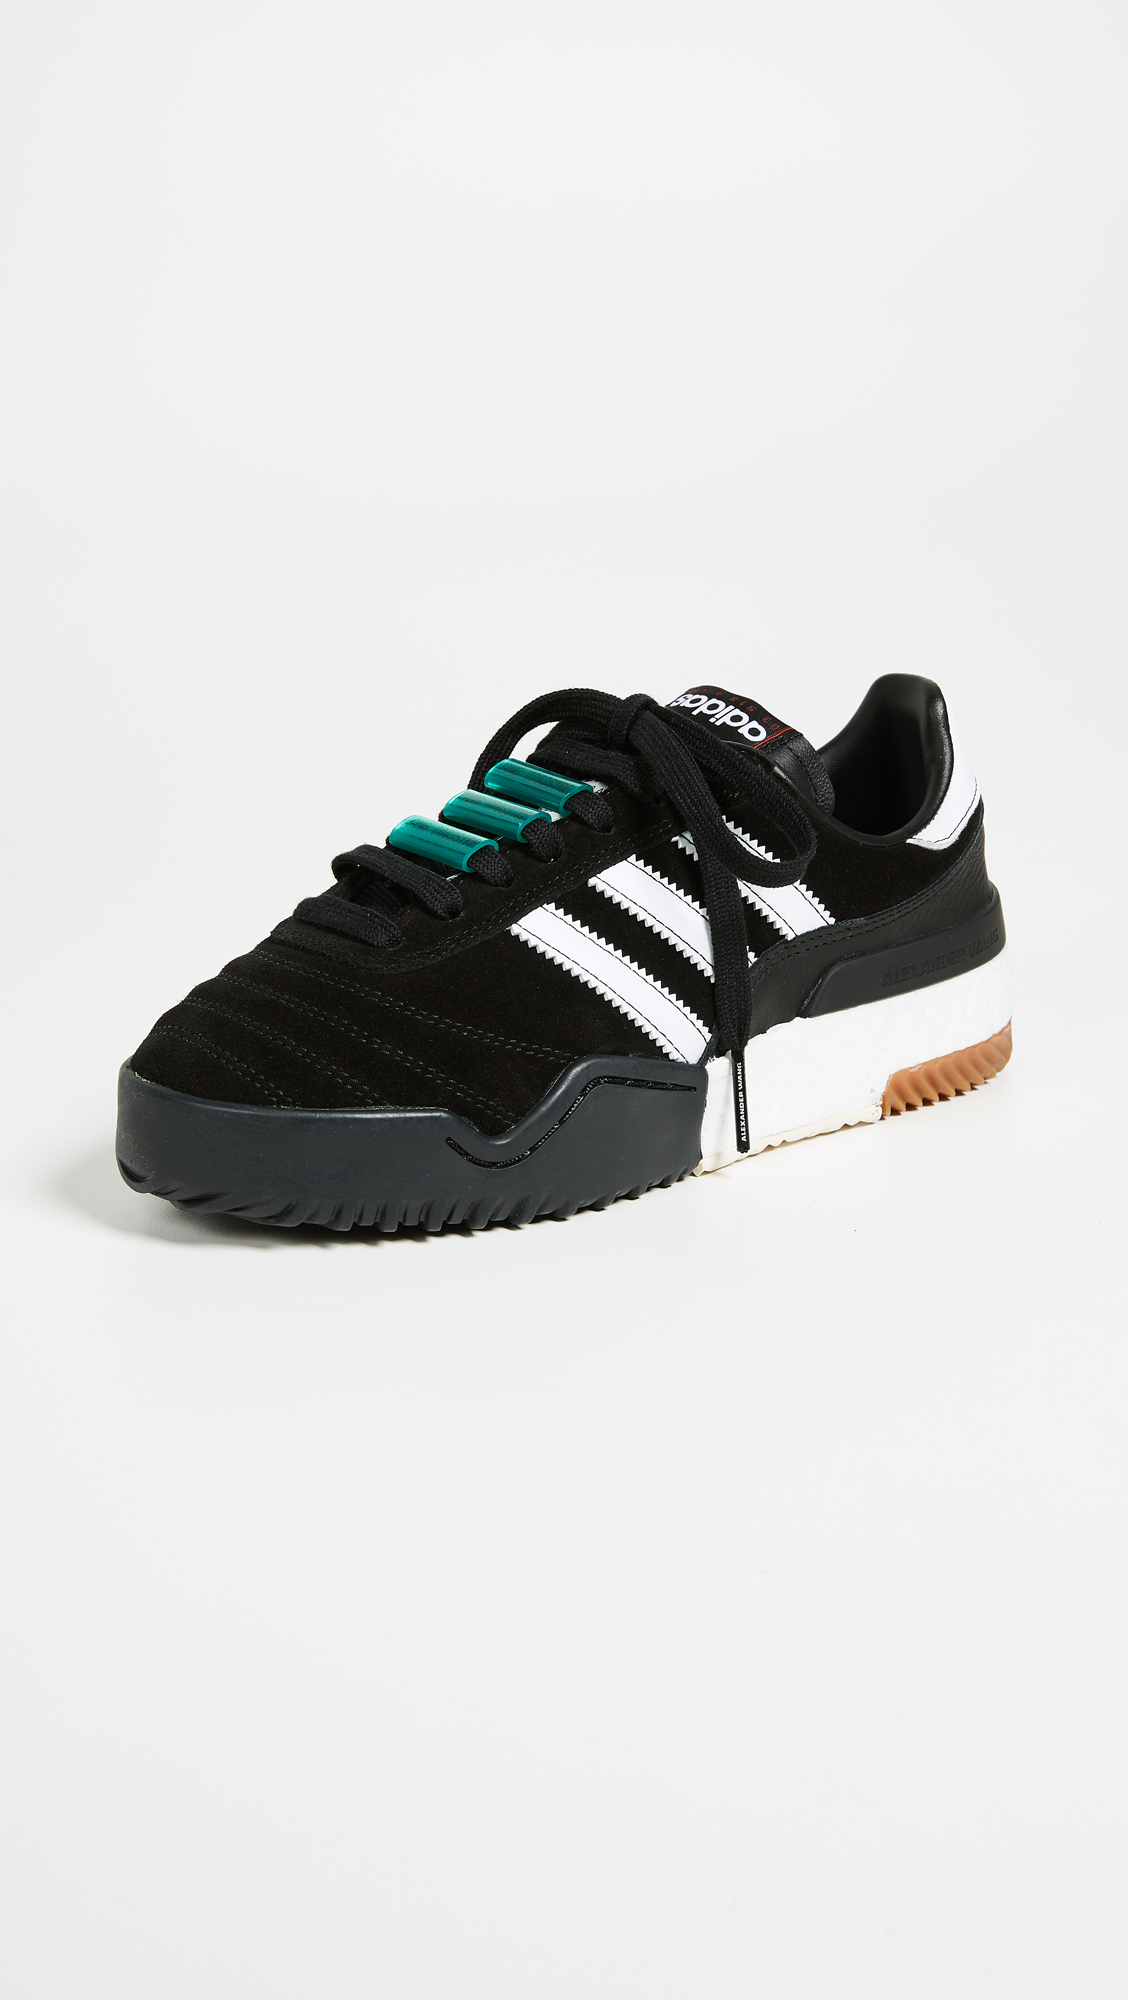 Women Adidas adidas Originals by Alexander Wang Soccer Shoes